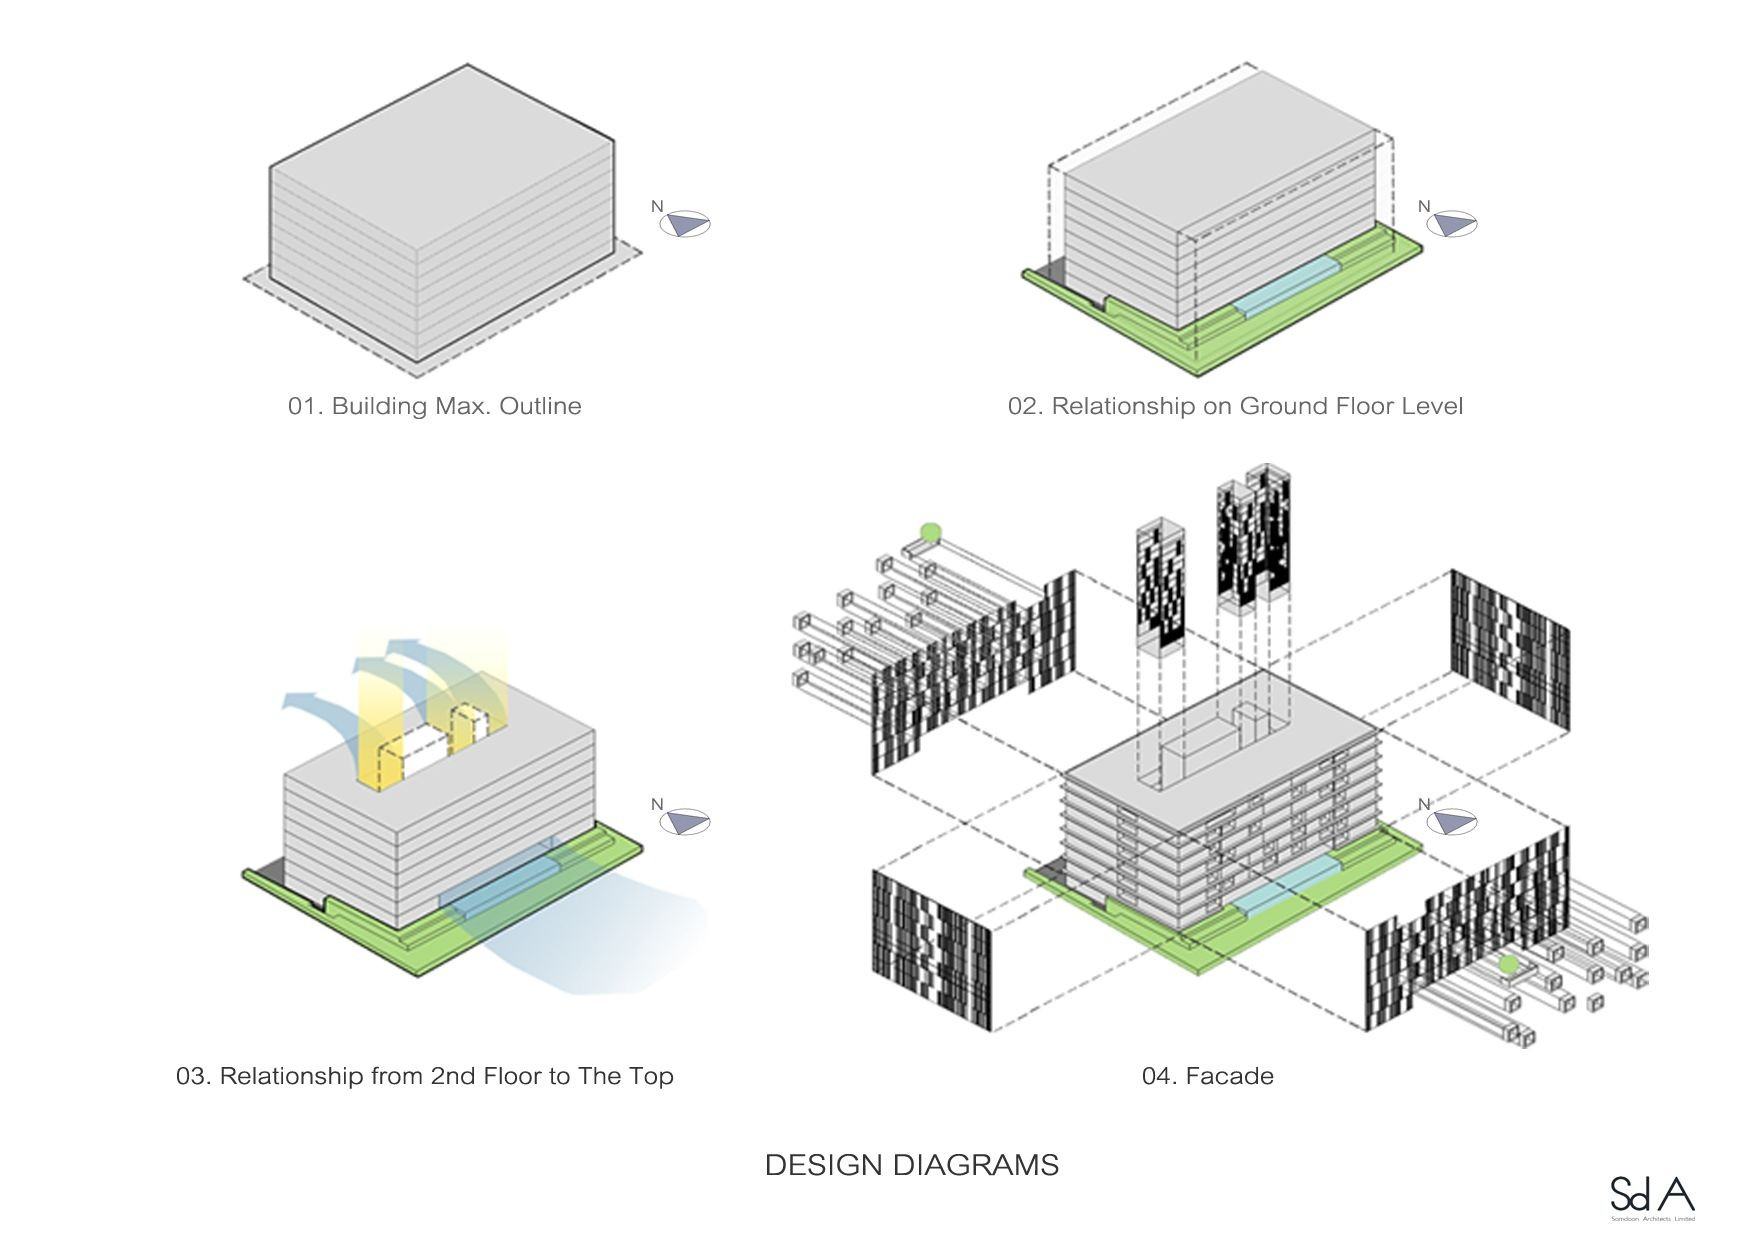 Gallery of via 31 somdoon architects ltd 23 for Architect ltd